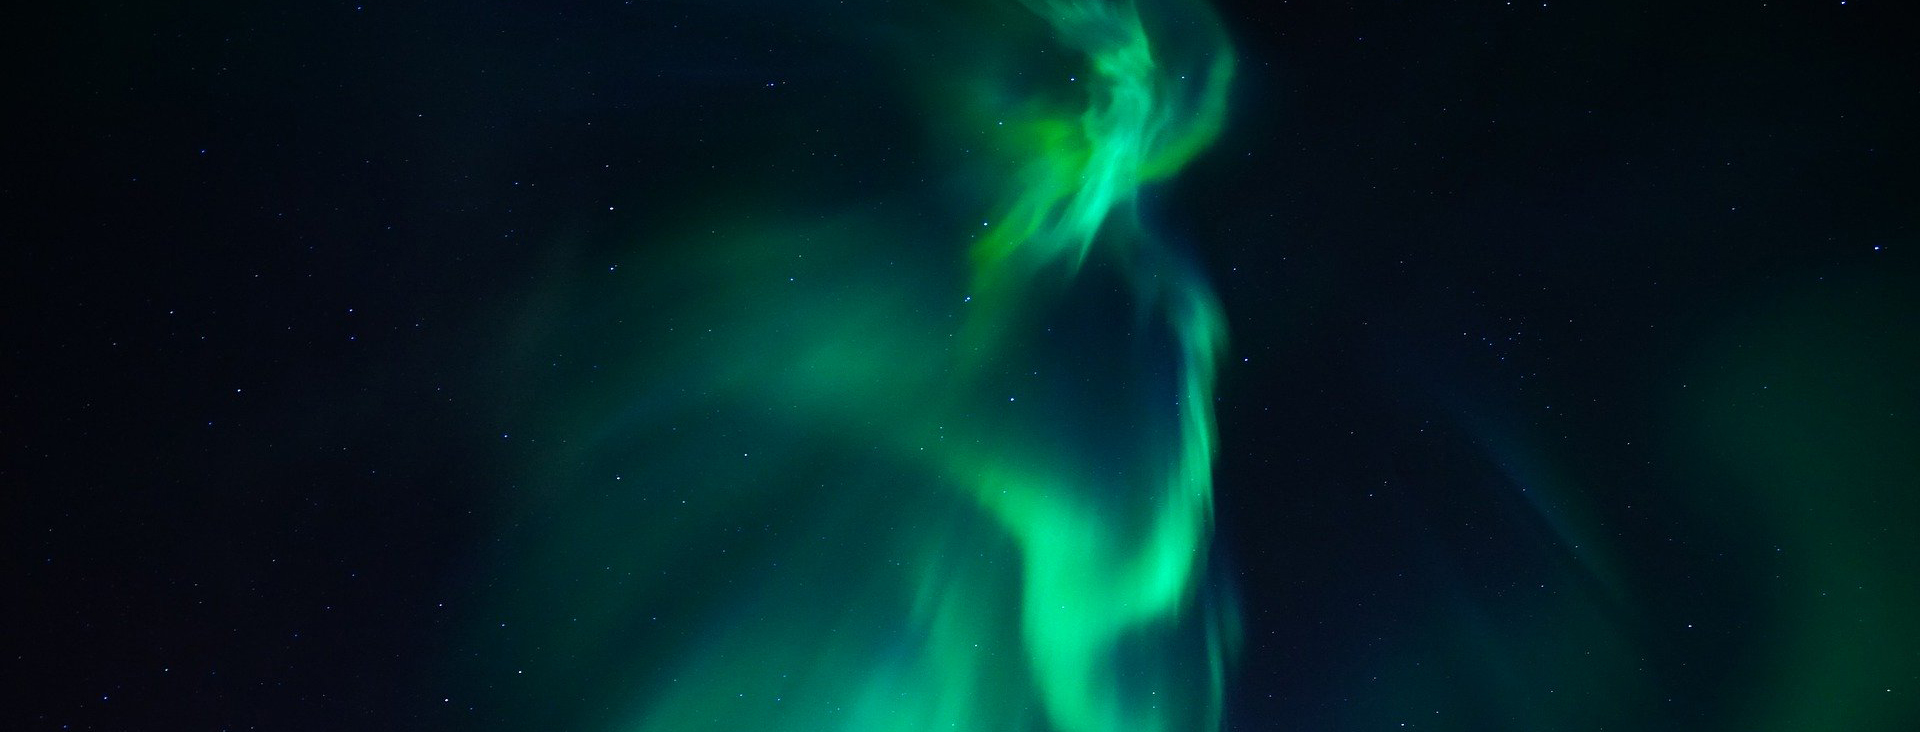 Flash of Green Light